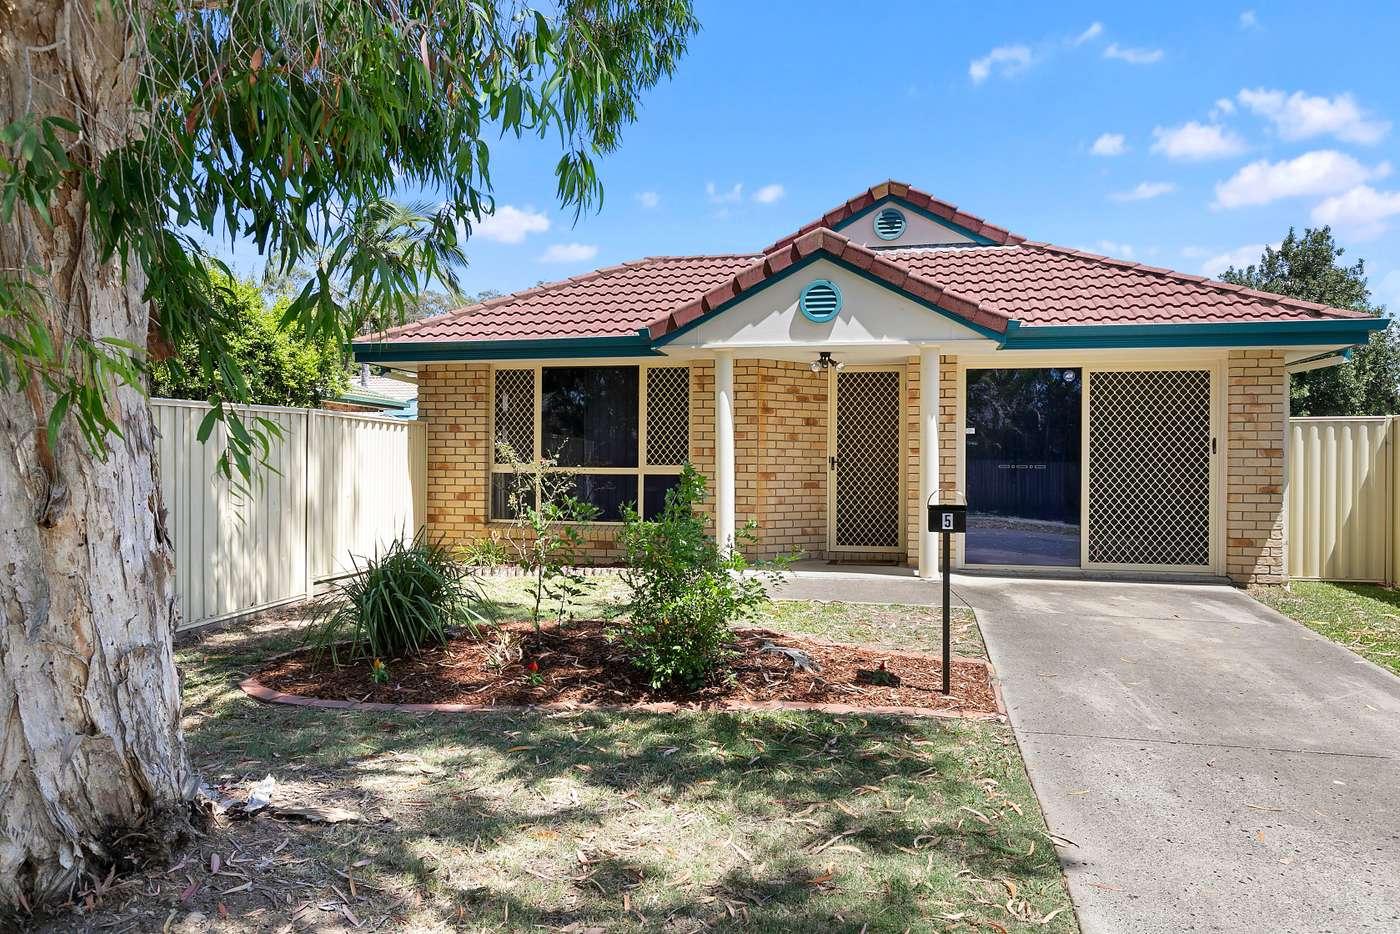 Main view of Homely house listing, 5 Perulpa Street, Tingalpa QLD 4173